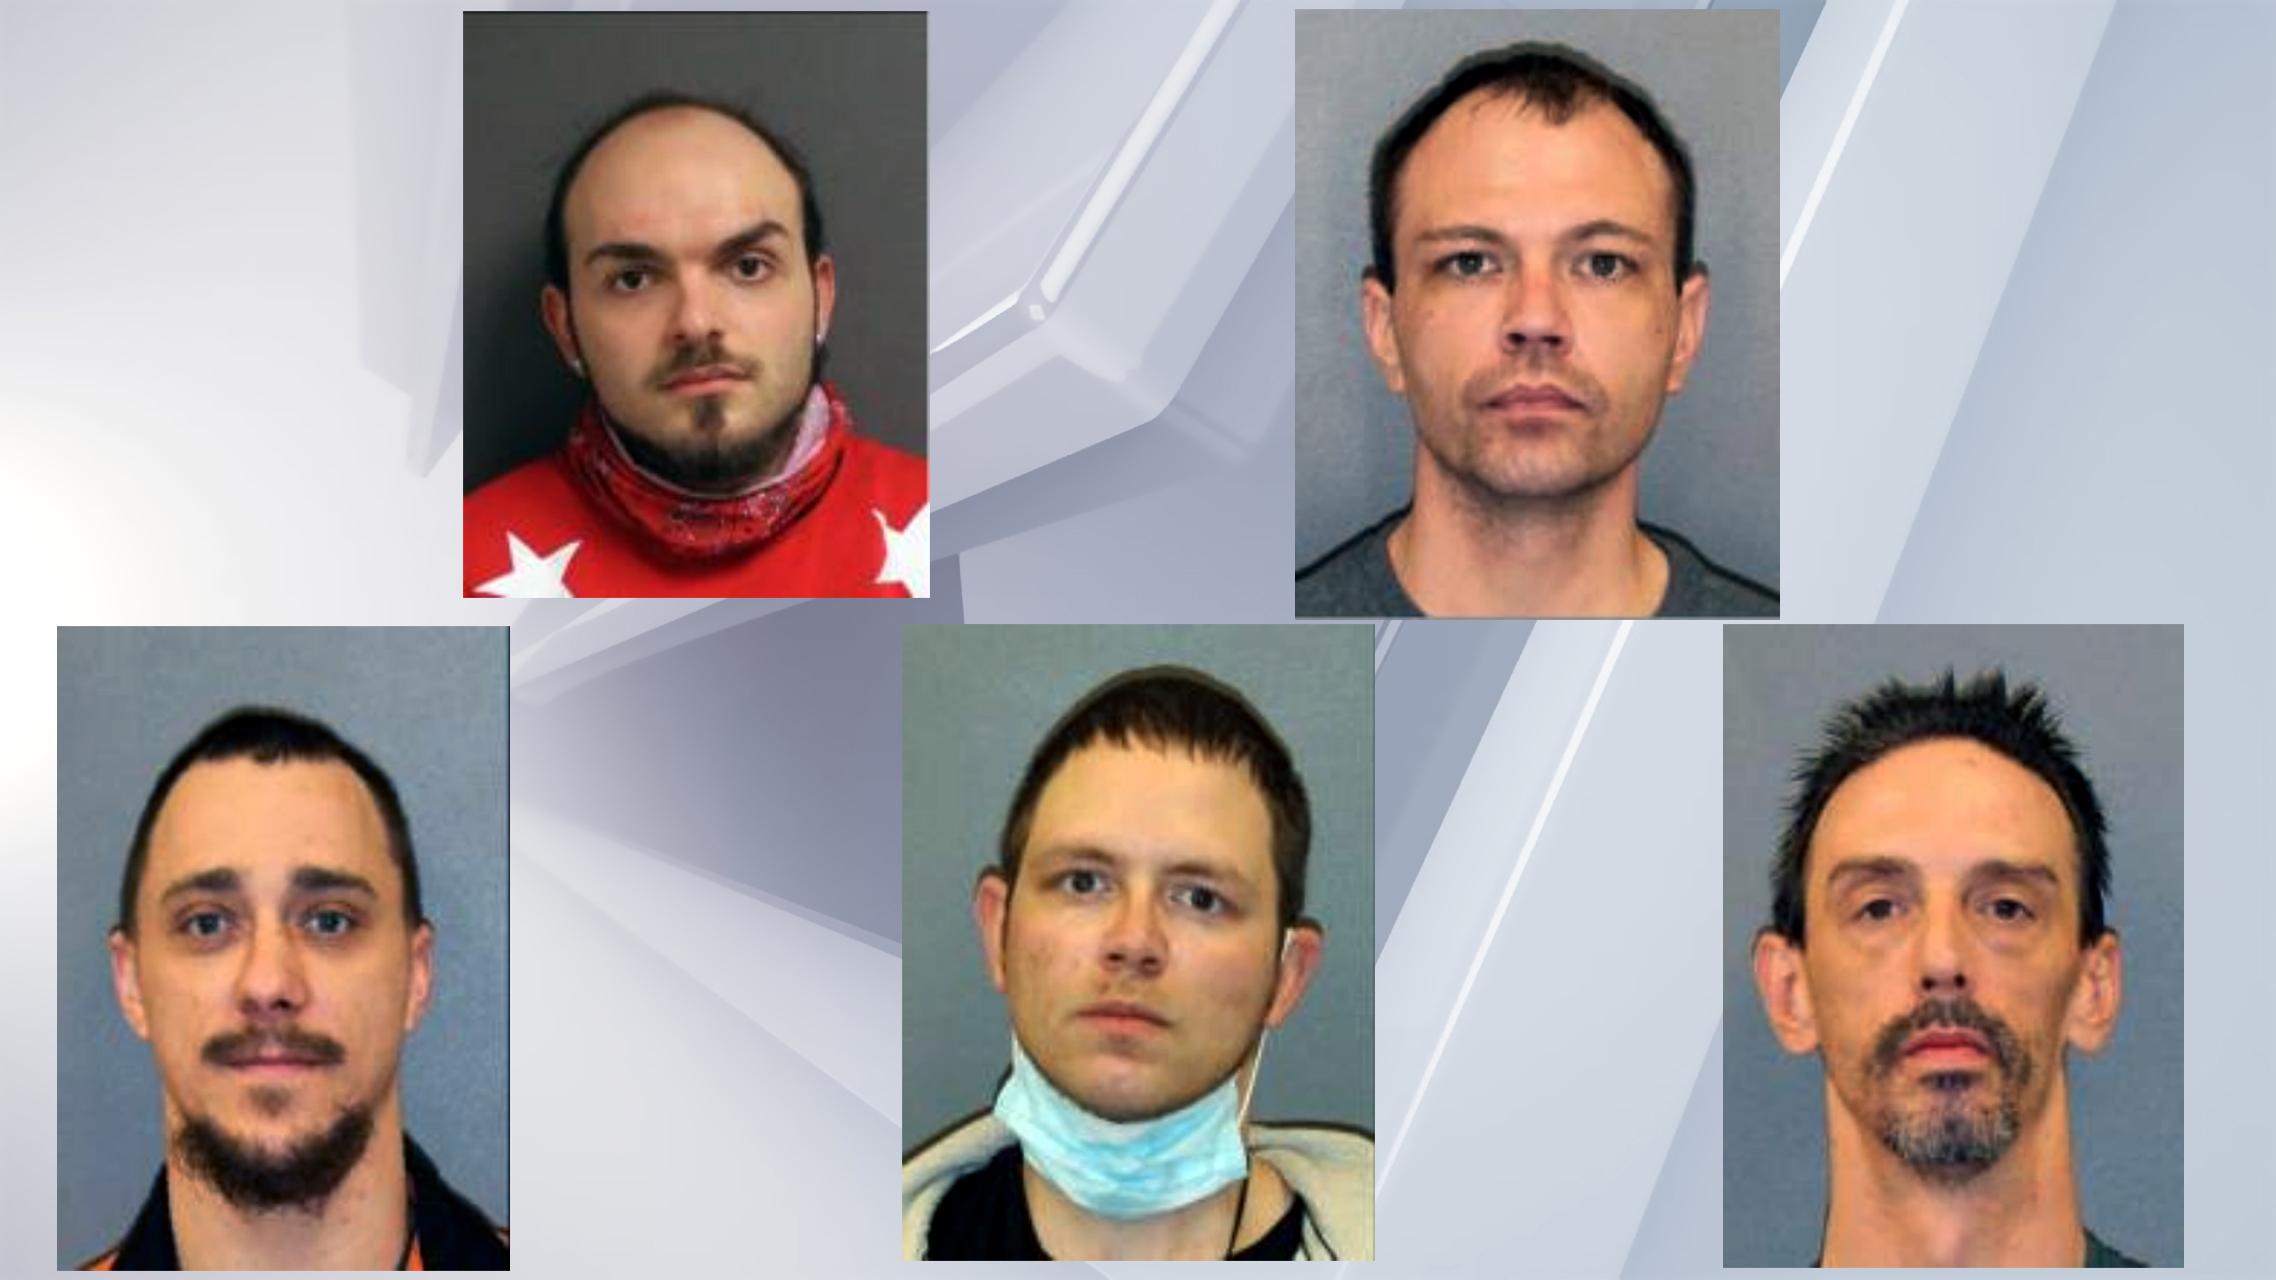 Mugshots for Tony Prichard, Nicholas Warner, Joshua Ferrucci, William Robison, and Patrick Disbrow (Saratoga County Sheriff)